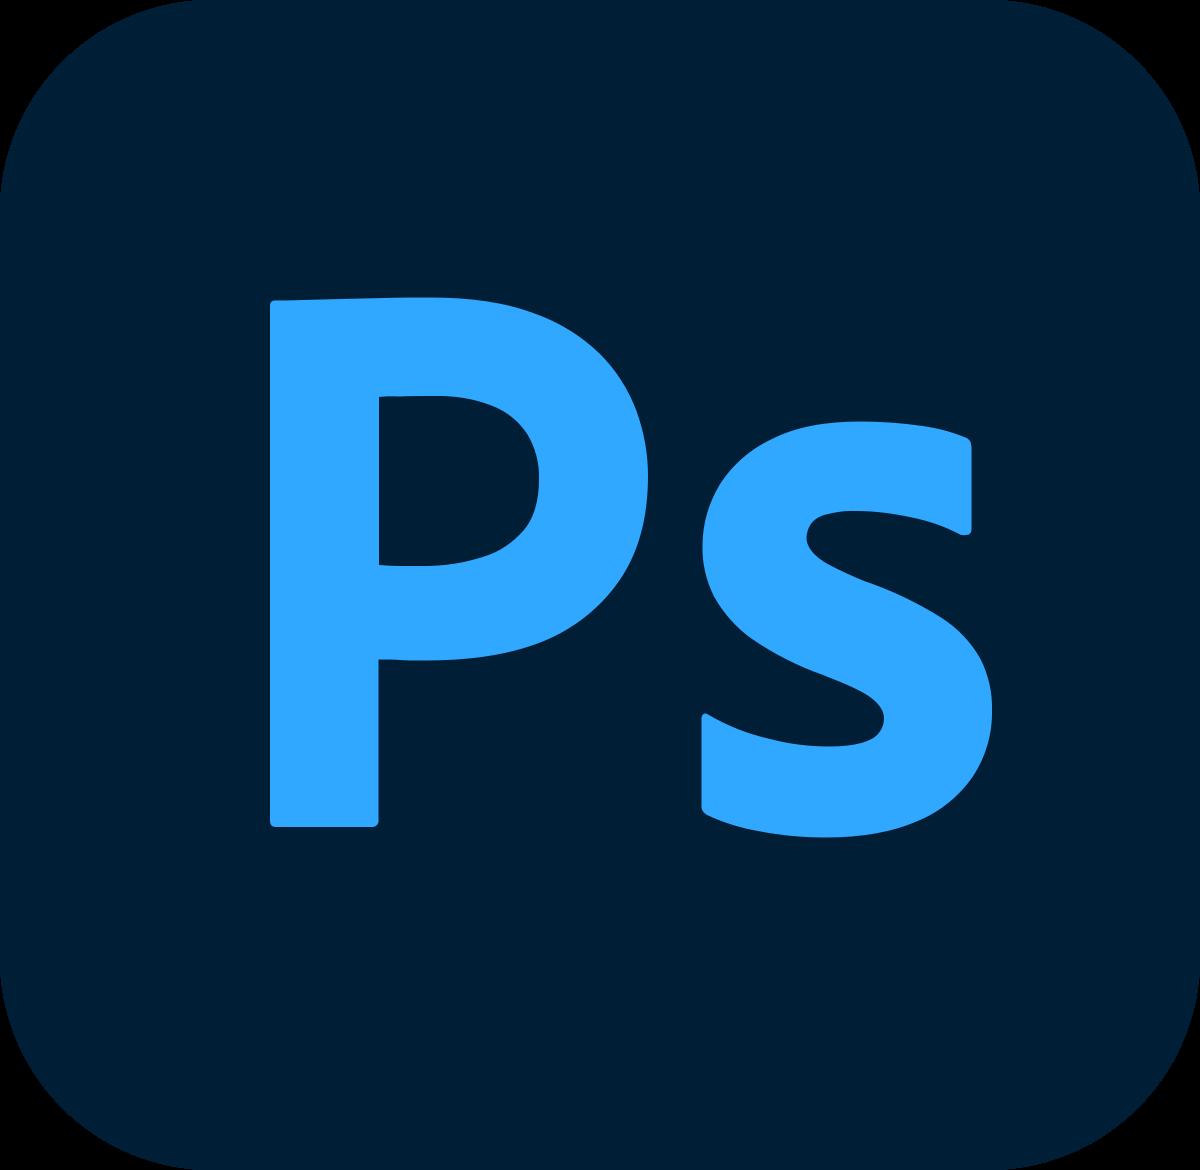 Idea Lab Demo: Photoshop Basic Editing